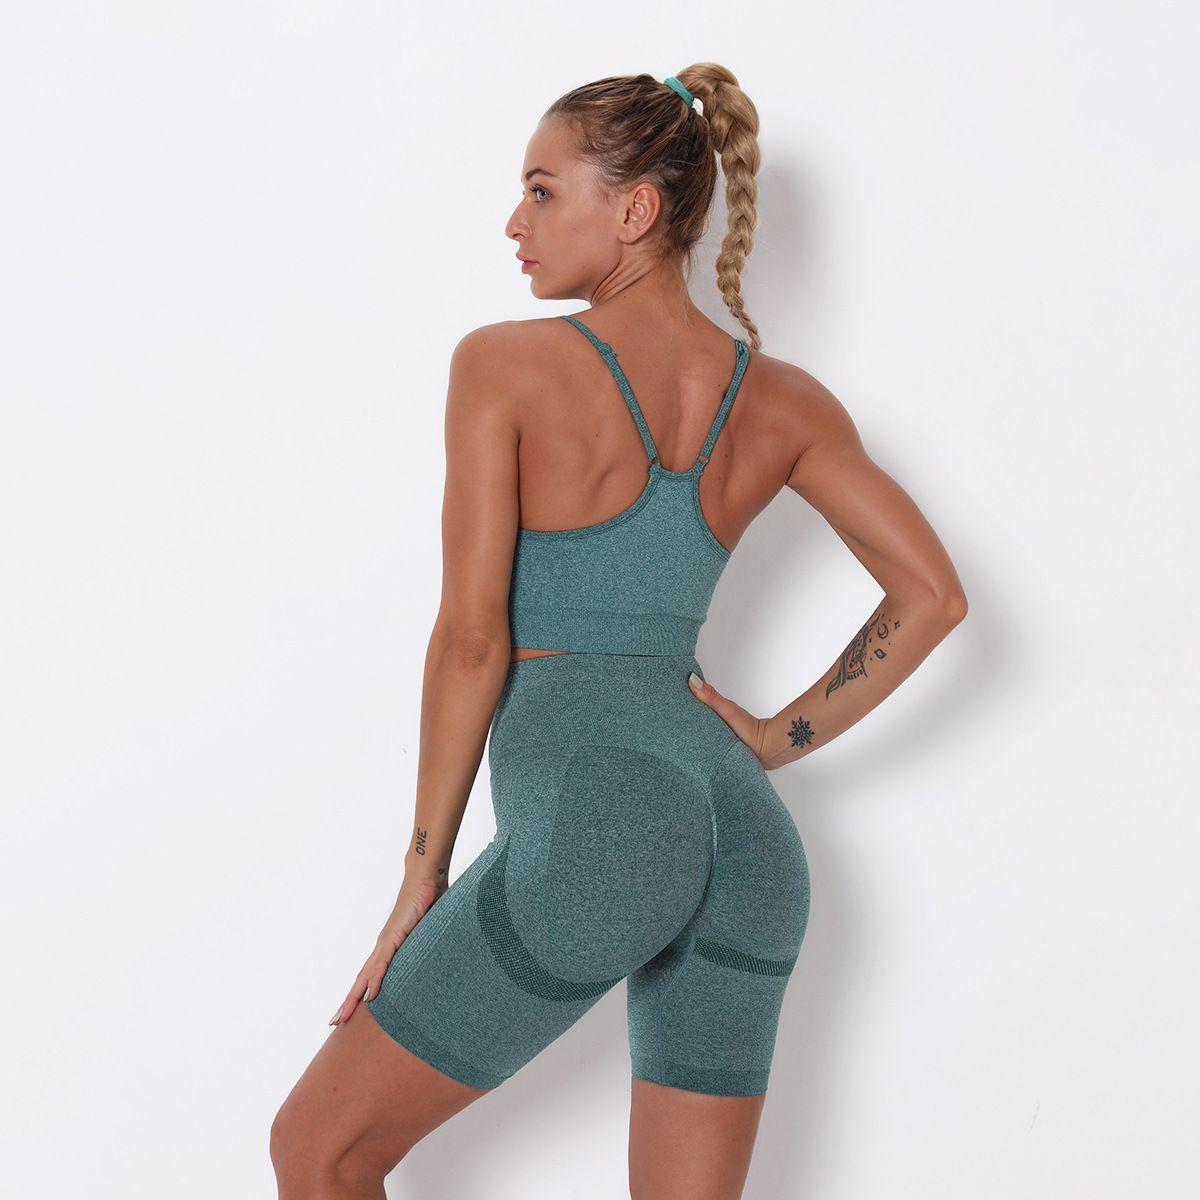 Trainingsanzüge Yoga Sportswear Sport Nahtlose Outfits Womens Zweiteiler Set Workout Shorts Sleeve Gym Massive Leggings Fitnessstudio Anzug Fitness Outdoor Yogaworld Richten Hose Lehre